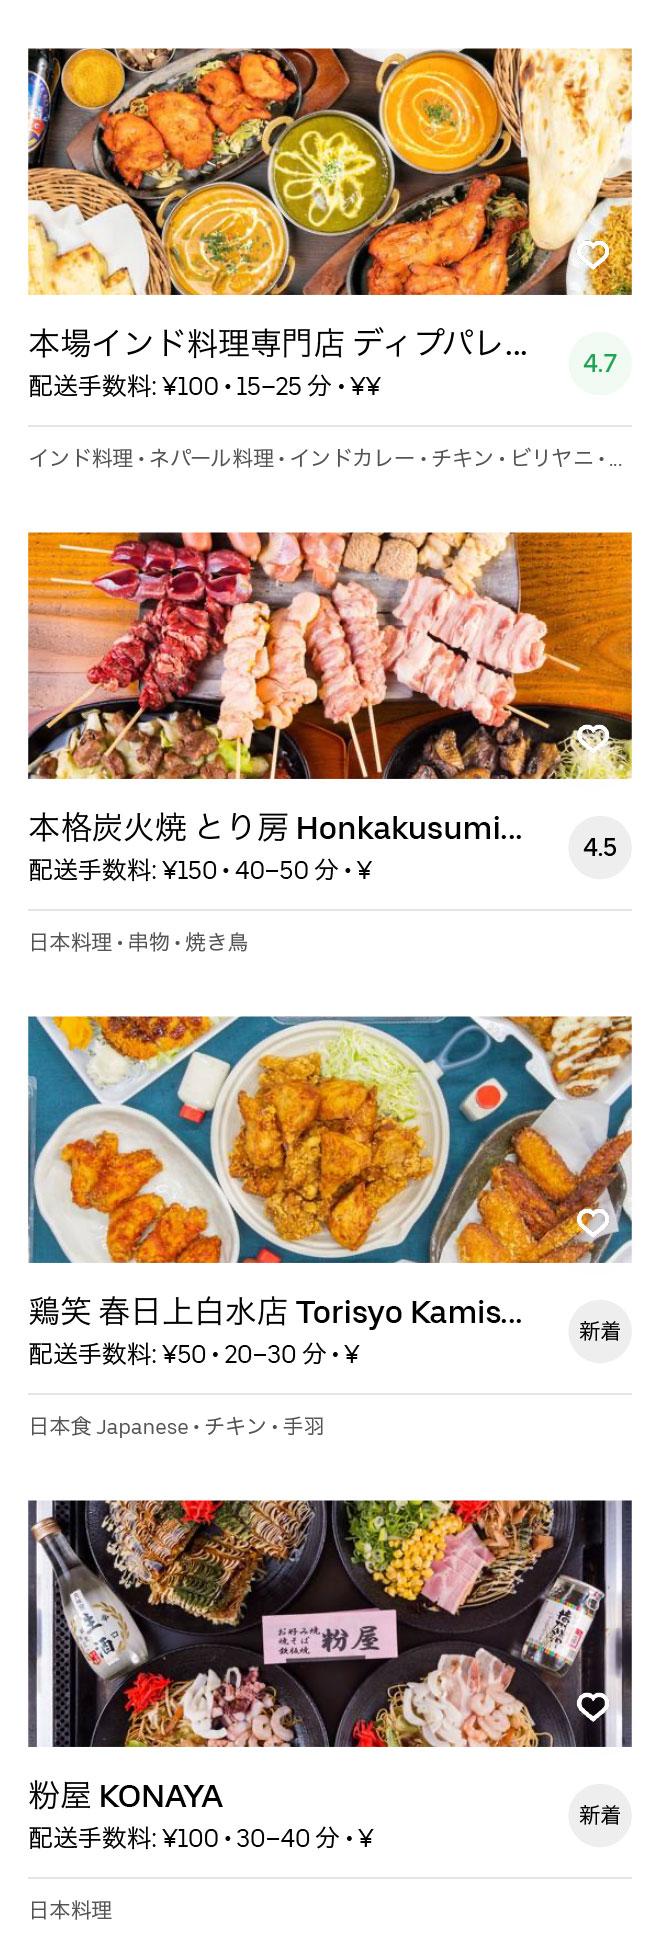 Kasuga hakataminami menu 2004 04